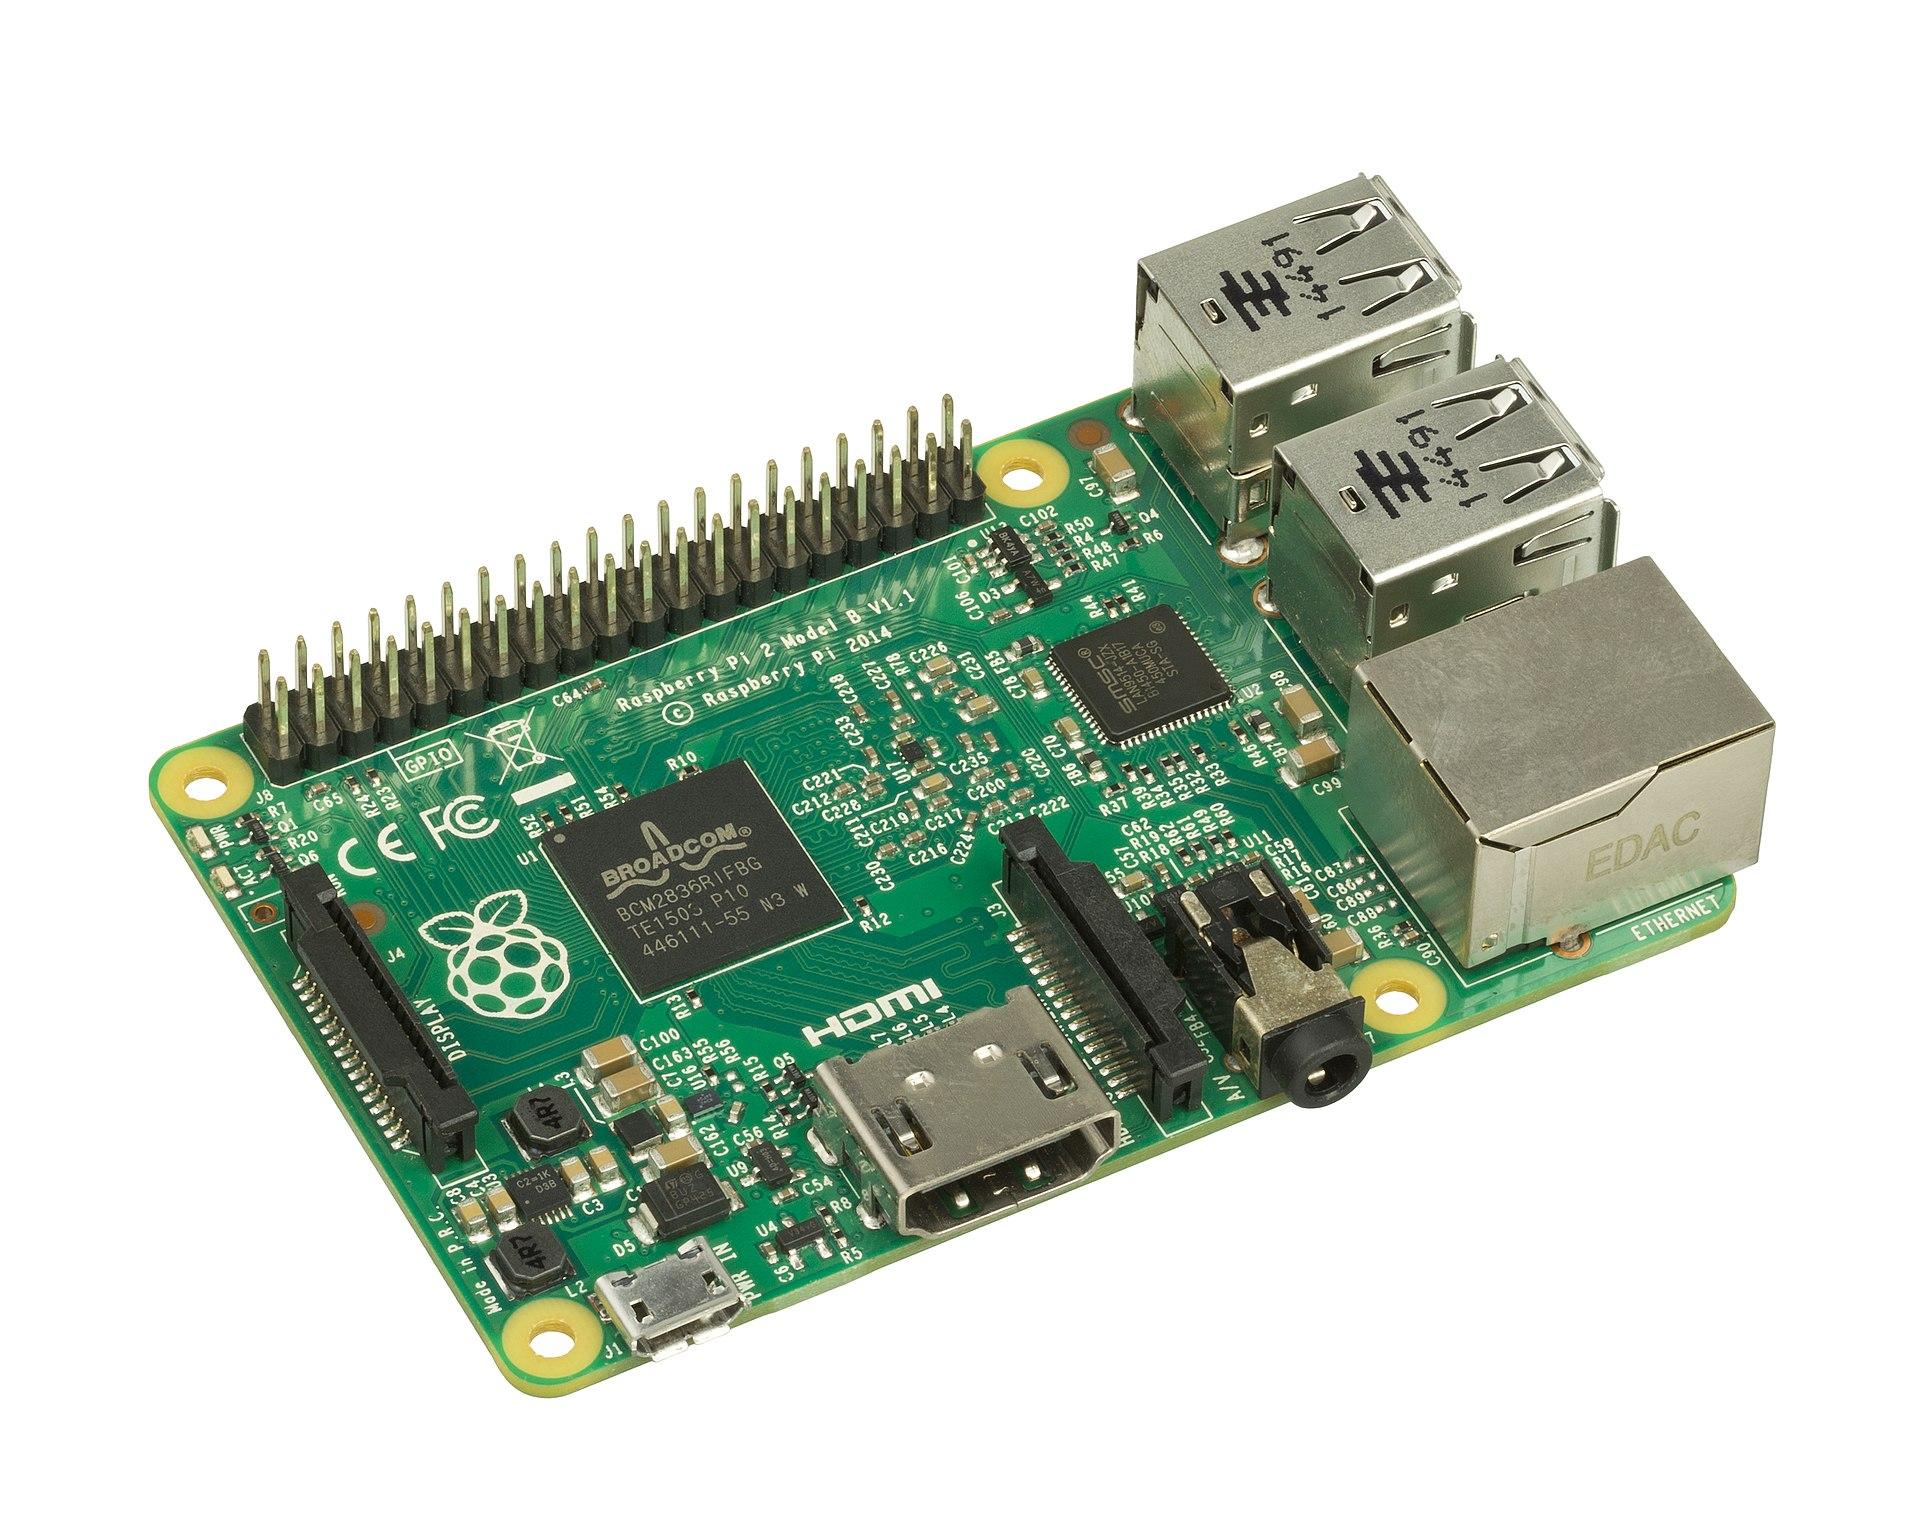 singleboard computer wikipedia